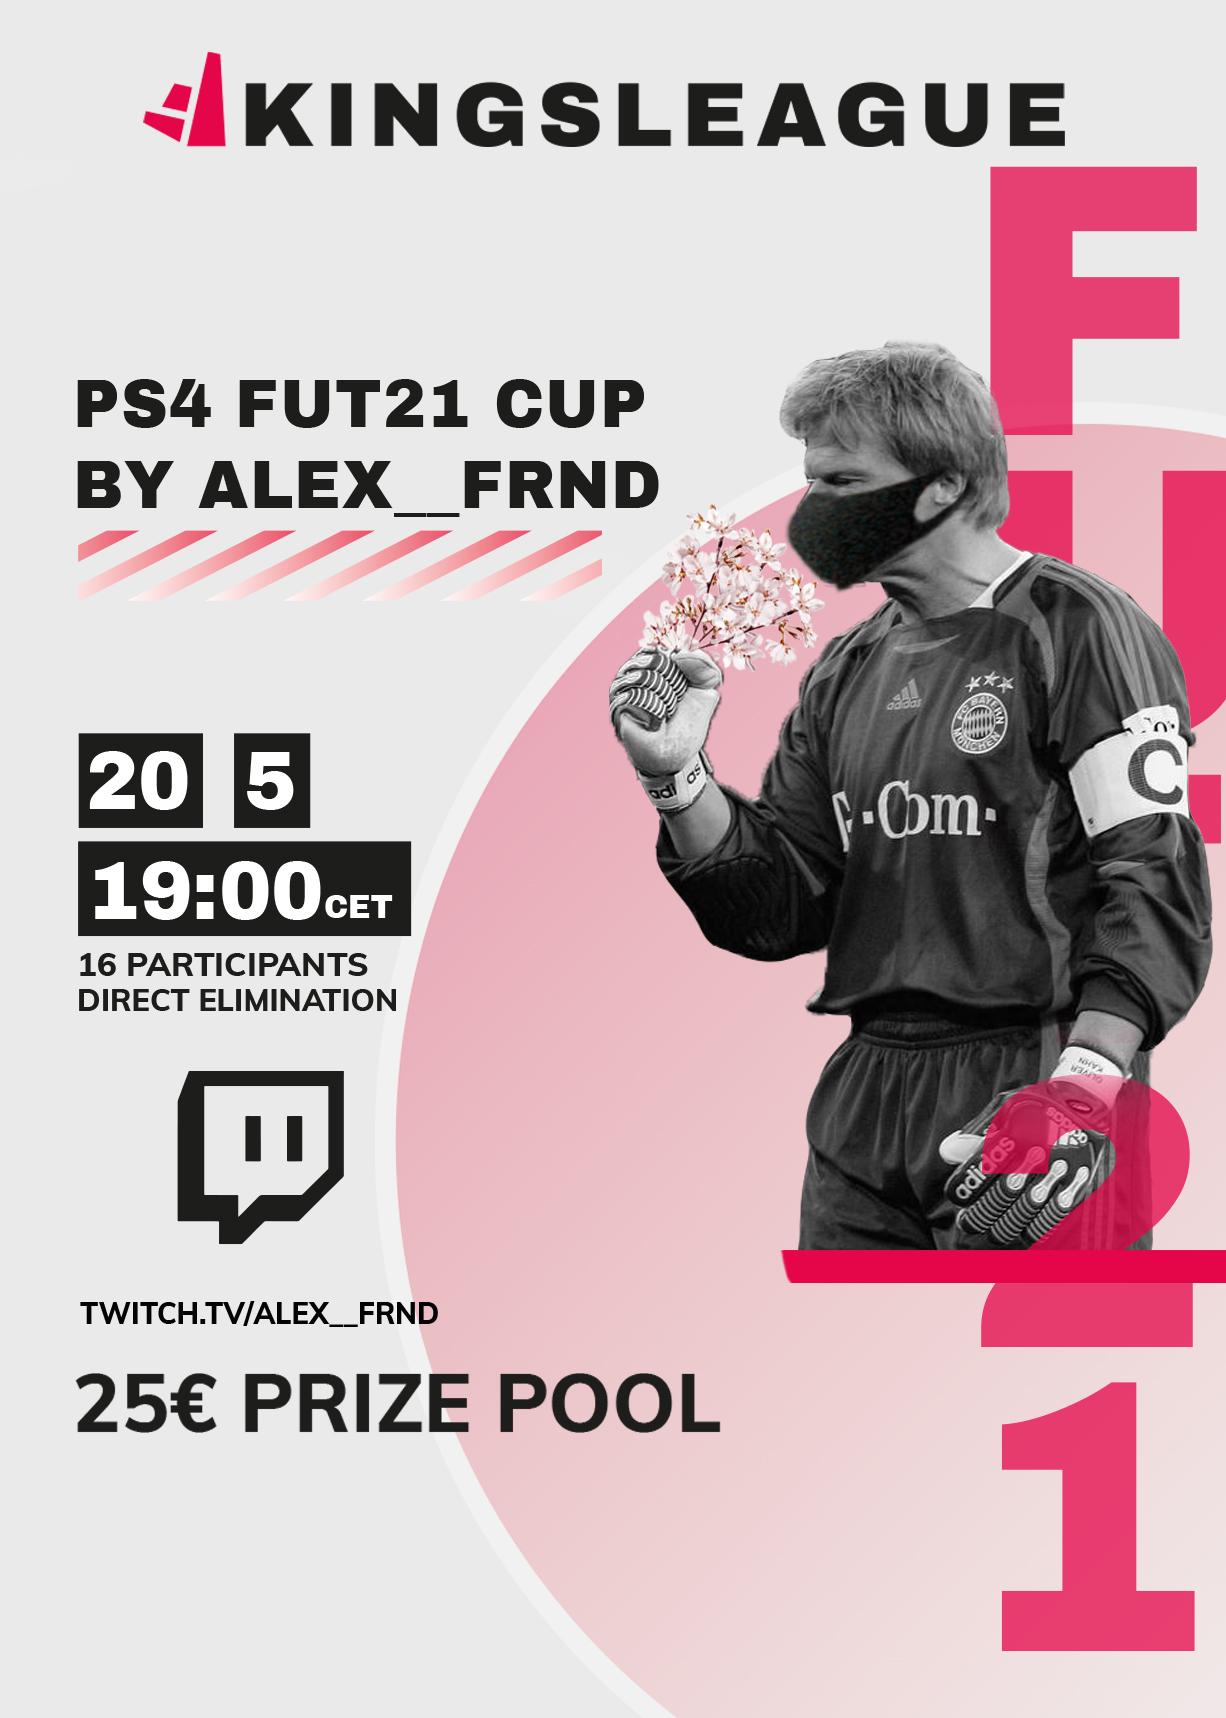 Kingsleague FUT21 Cup by Alex_frnd